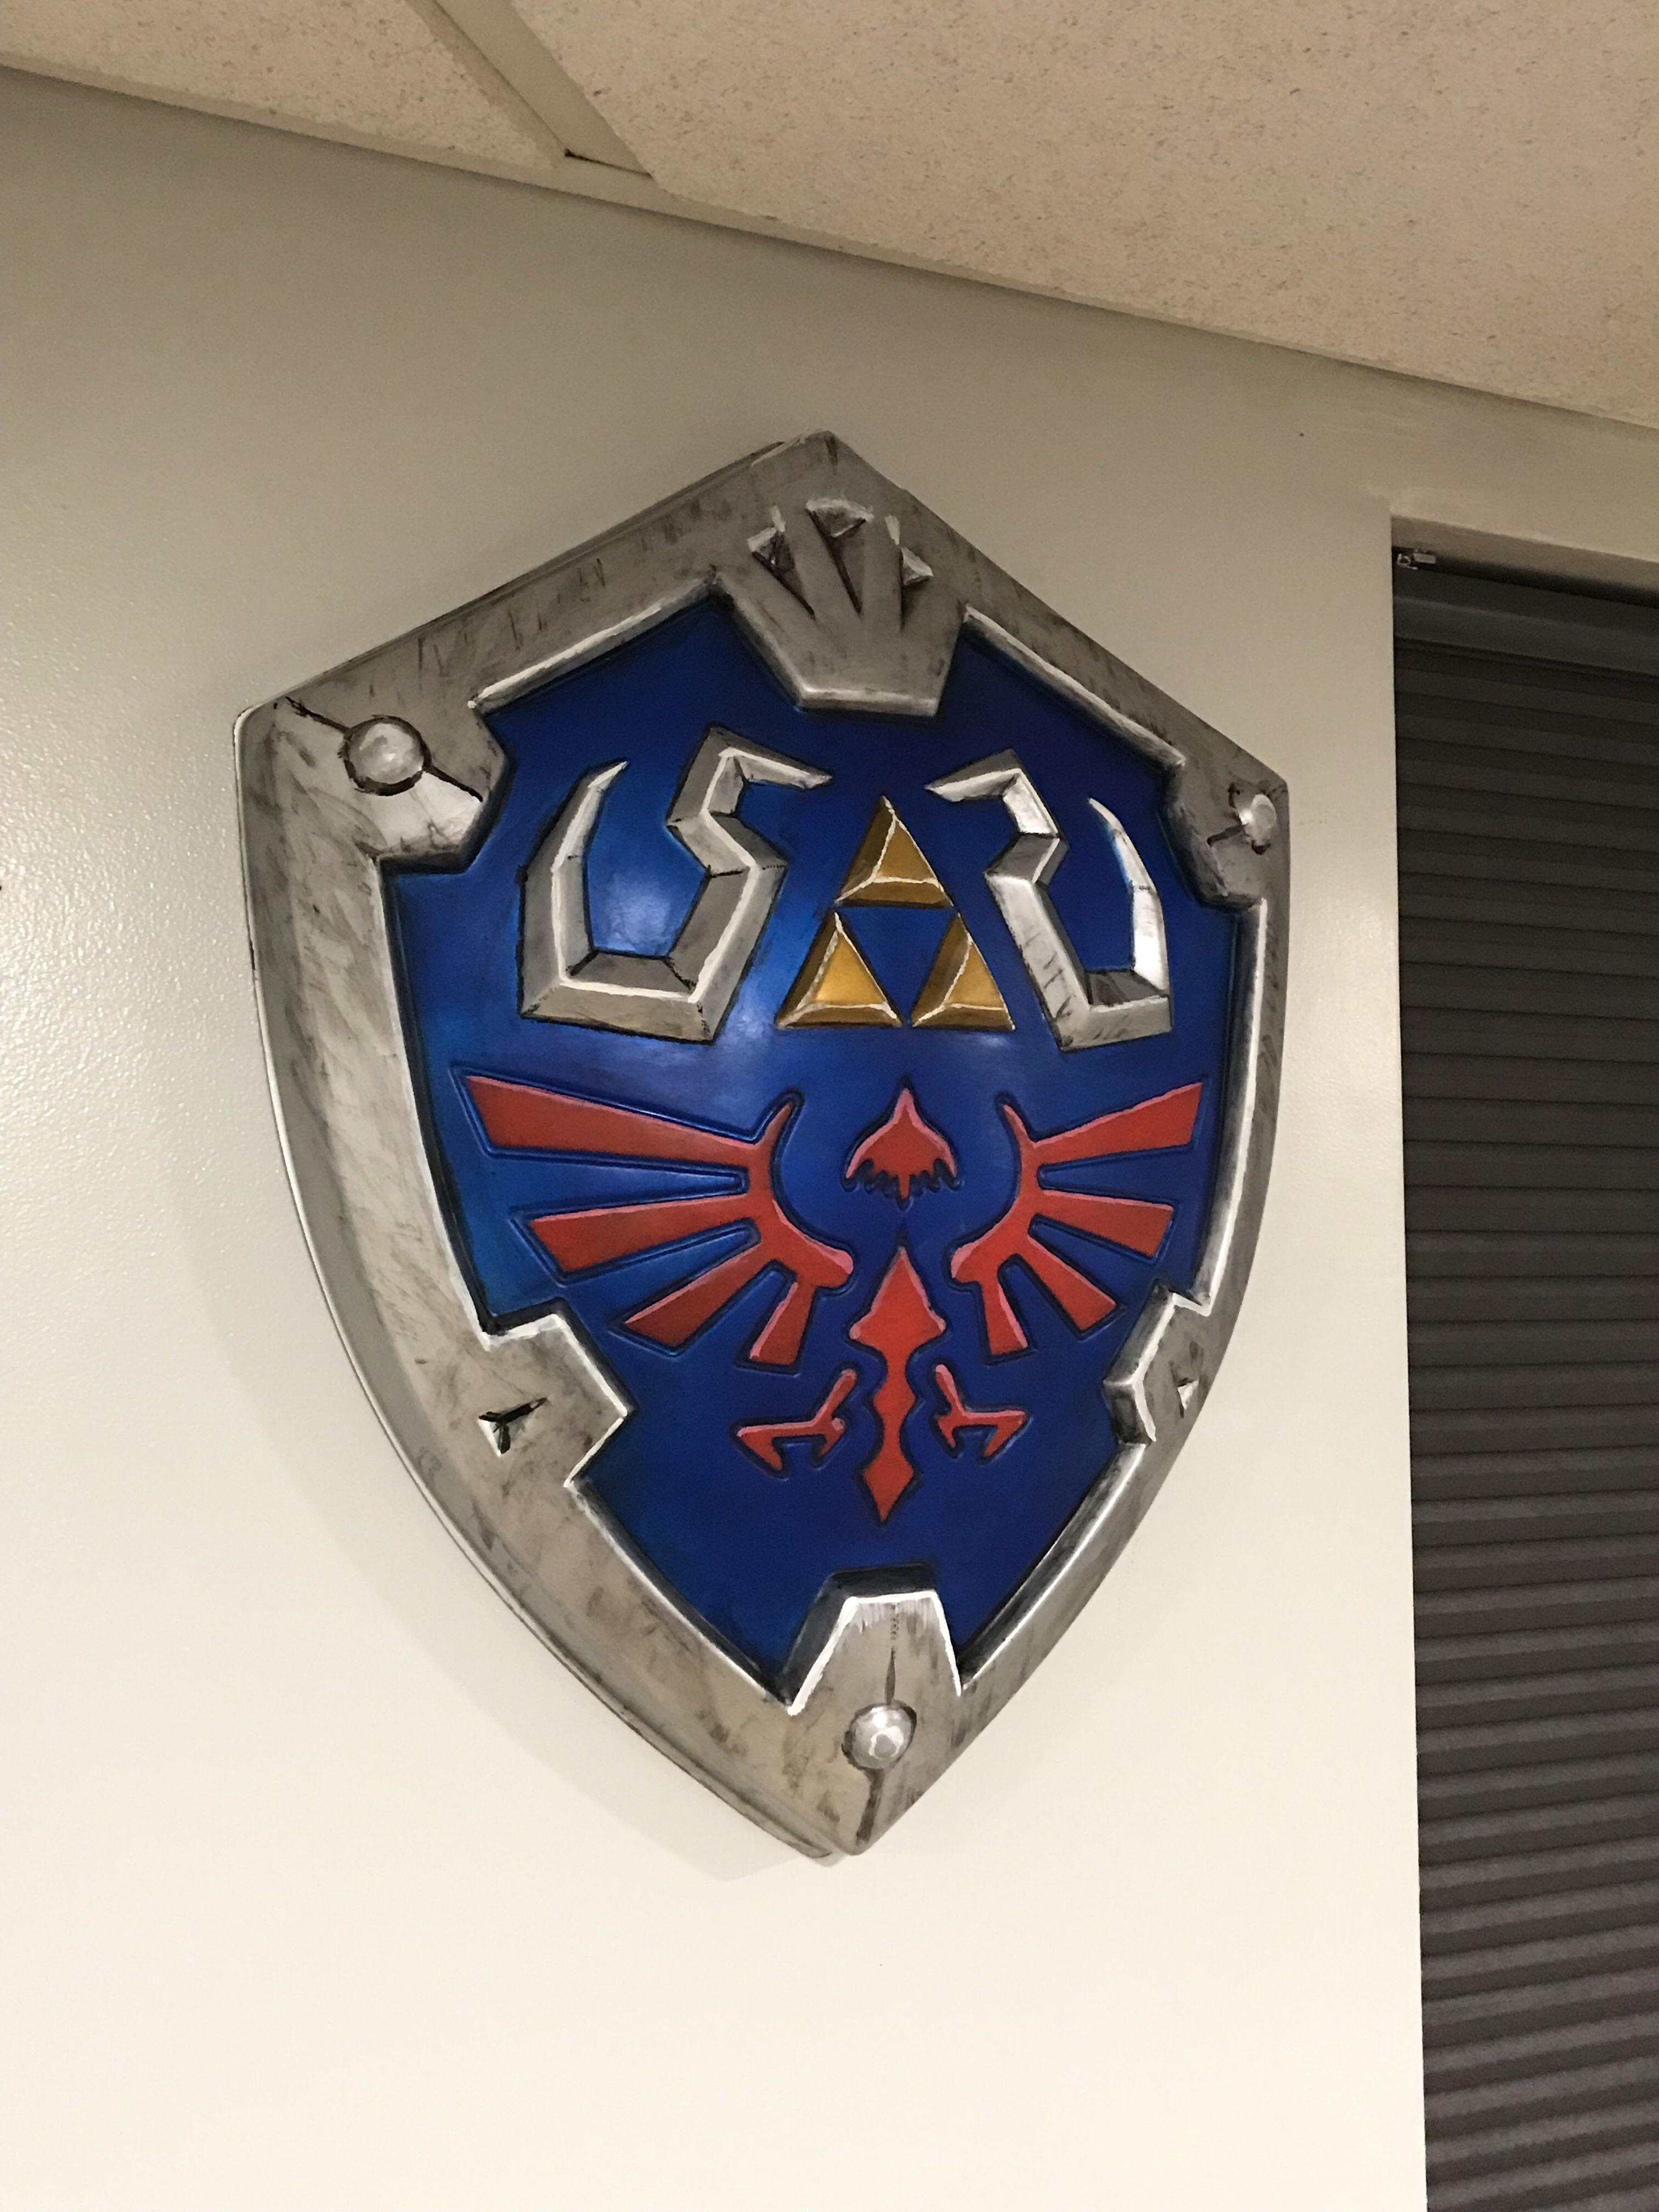 Loving My New Wall Decor Visit Blazezelda Tumblr Com Legend Of Zelda Video Game Companies Valar Morghulis